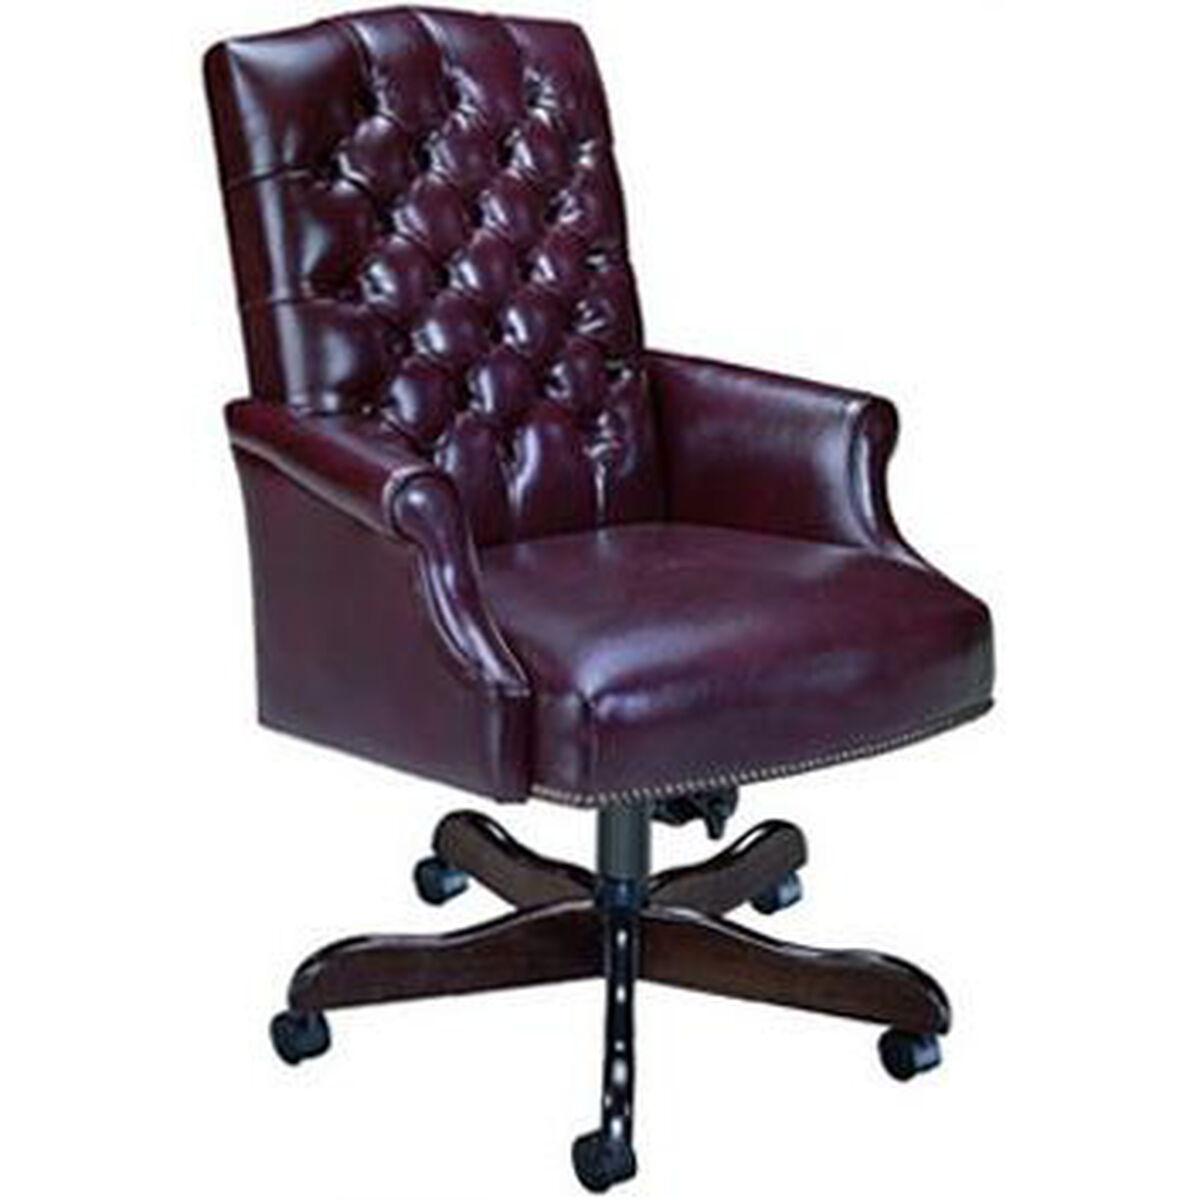 High Point Furniture Industries 2177 Hpf 2177